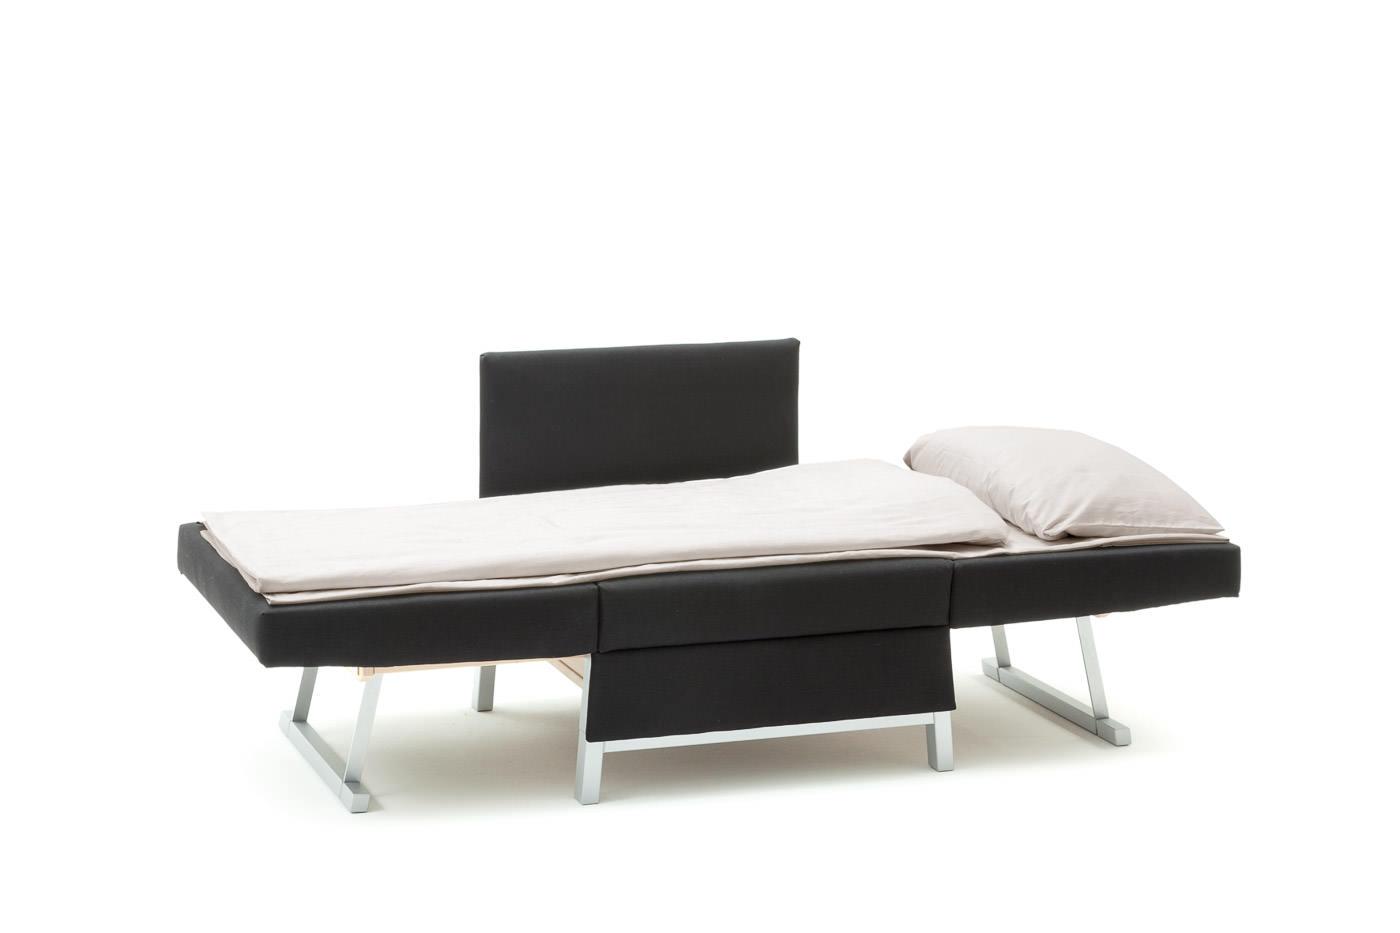 sessel zum schlafen best jupi with sessel zum schlafen excellent jupi with sessel zum schlafen. Black Bedroom Furniture Sets. Home Design Ideas